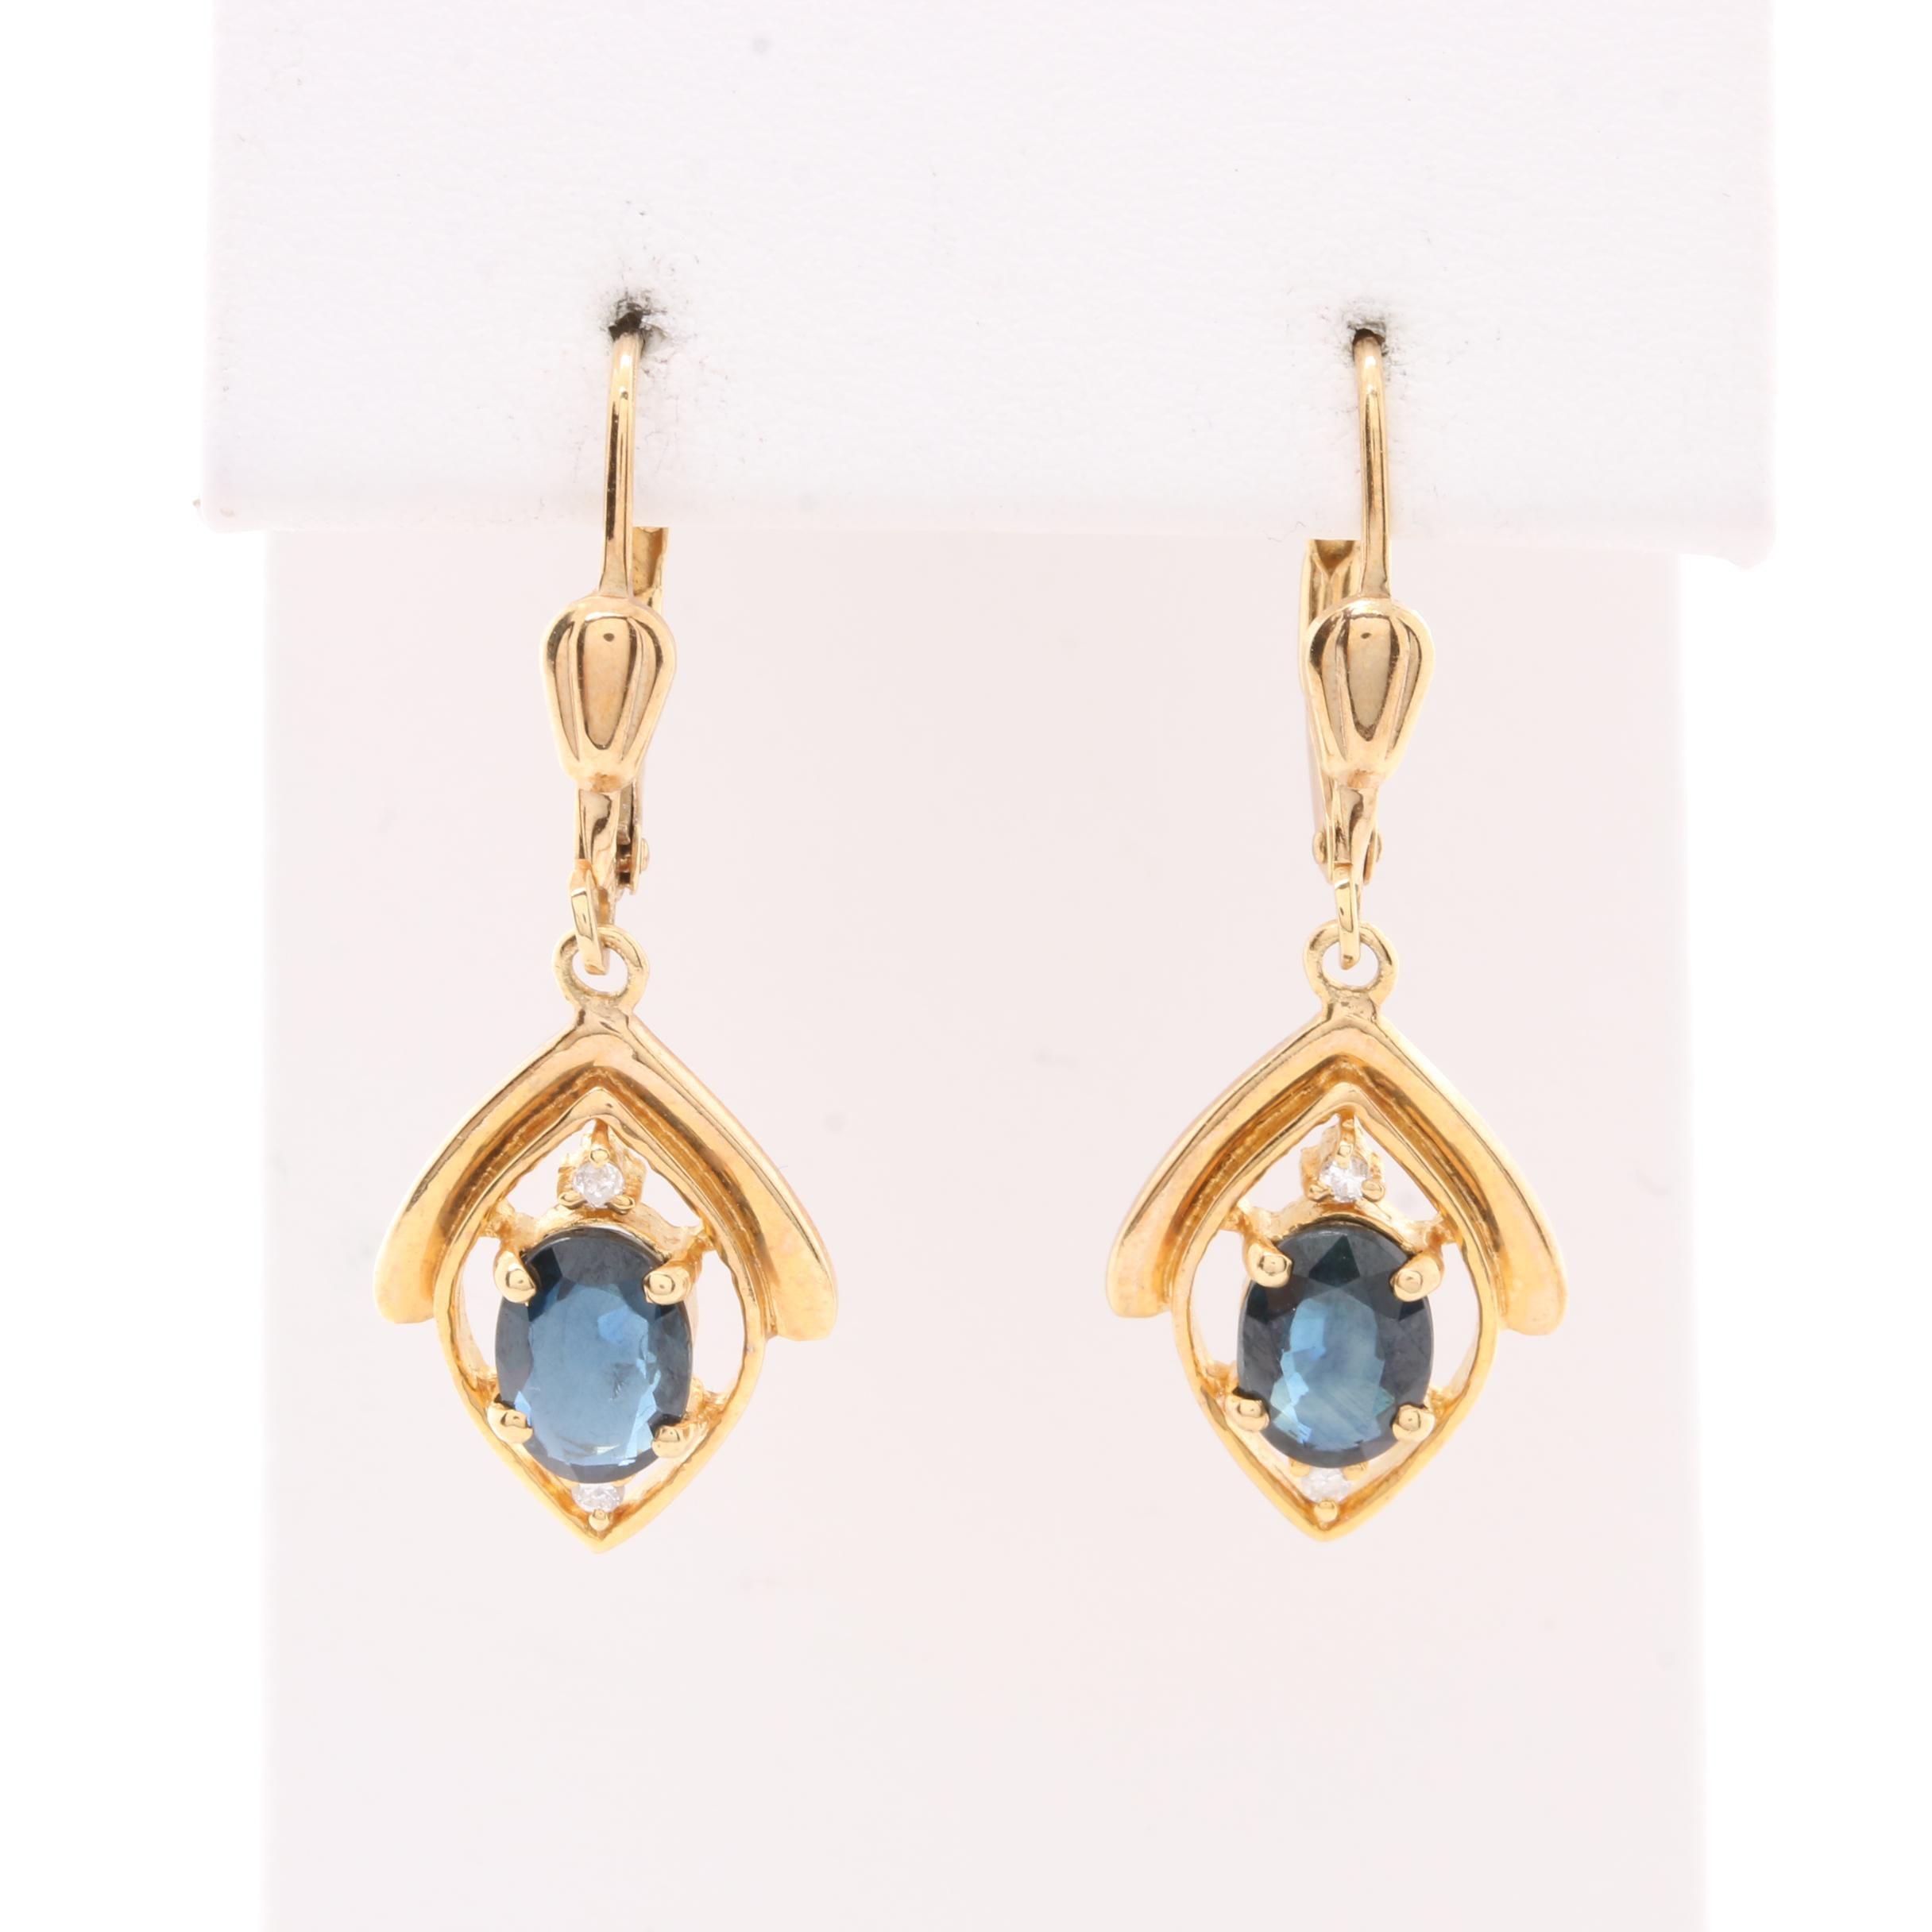 14K Yellow Gold Blue Sapphire and Diamond Dangle Earrings